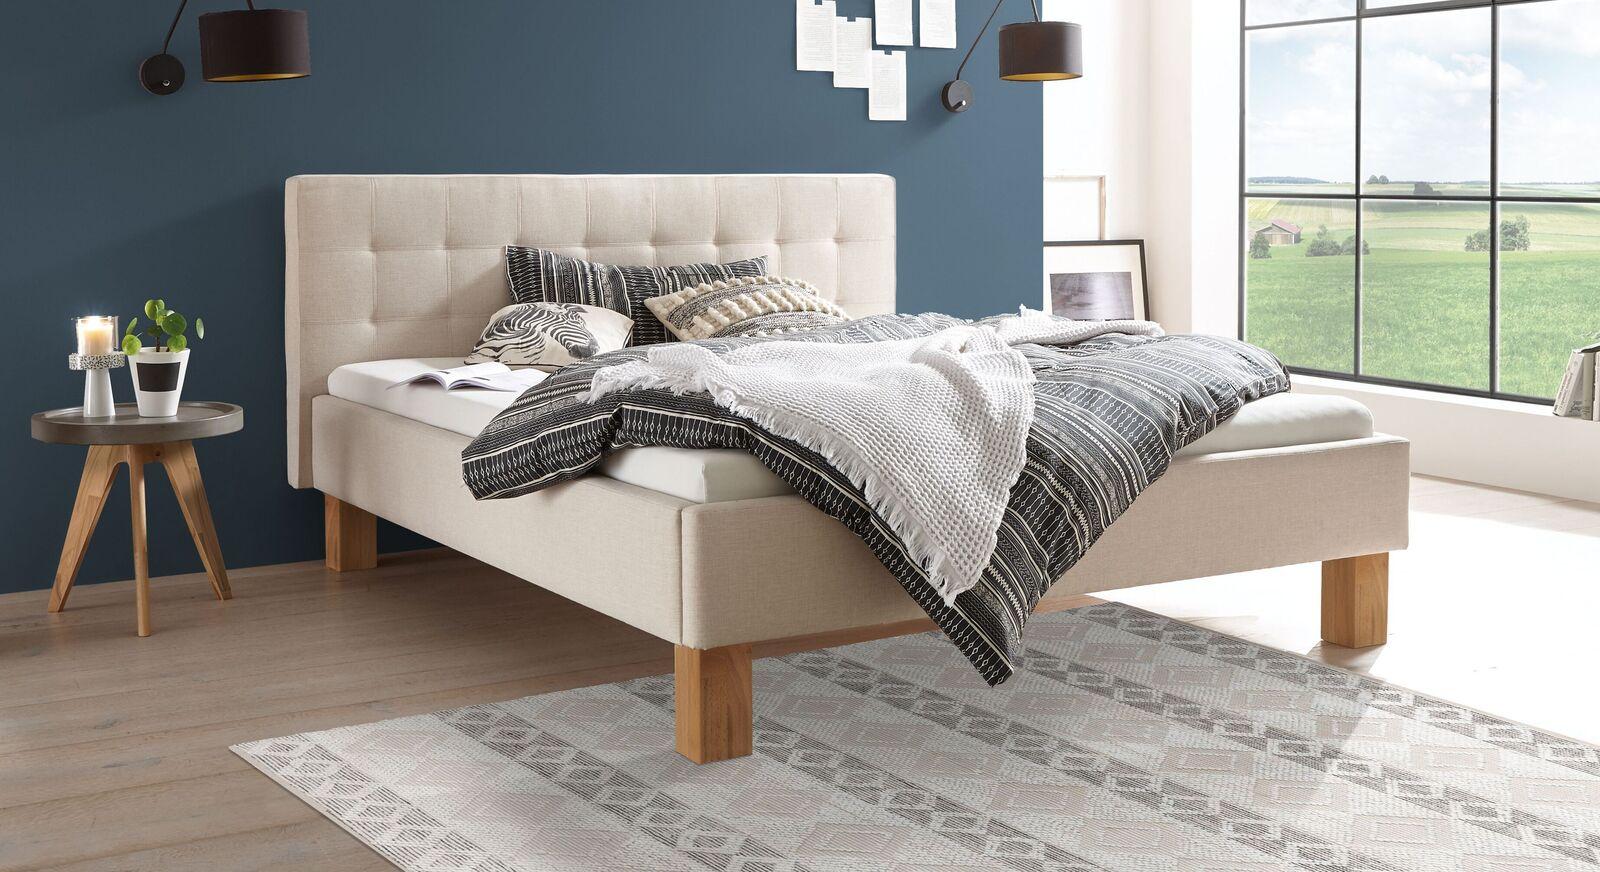 Bett Nieta aus beigefarbenem Webstoff